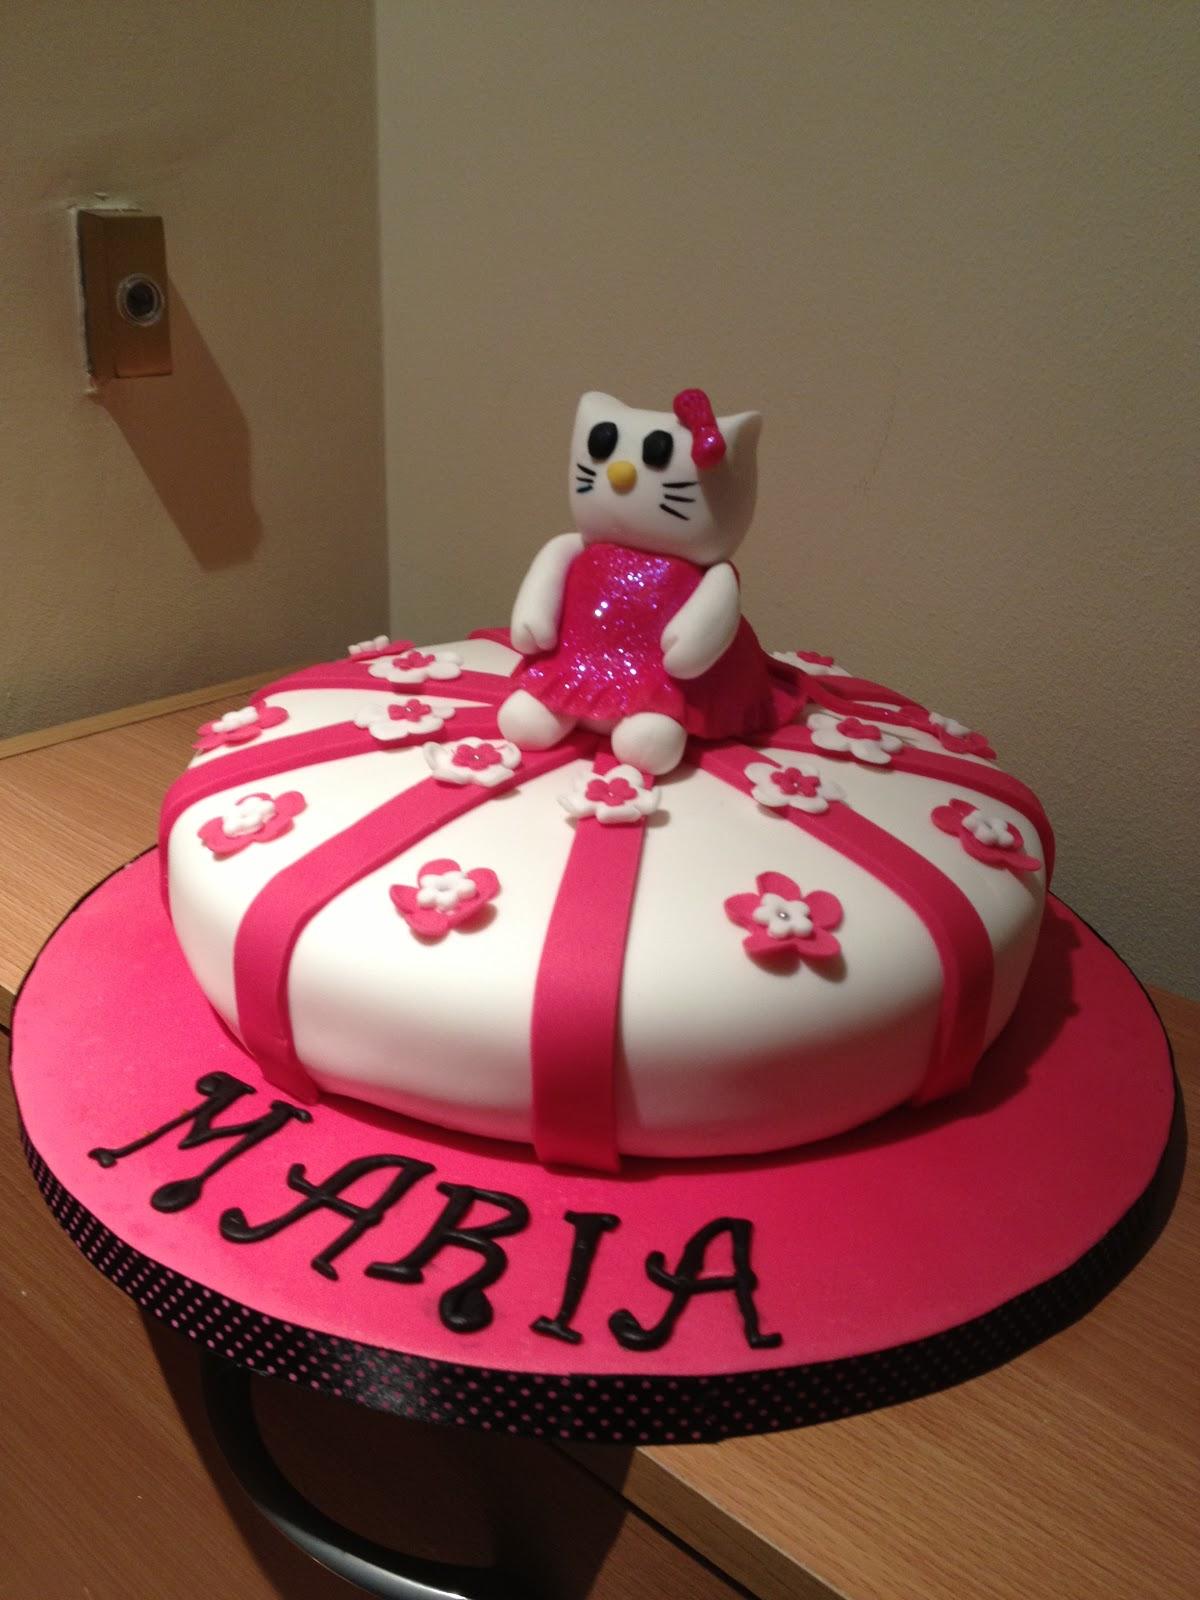 Adventures of a wannabe baker: Hello Kitty 8th birthday